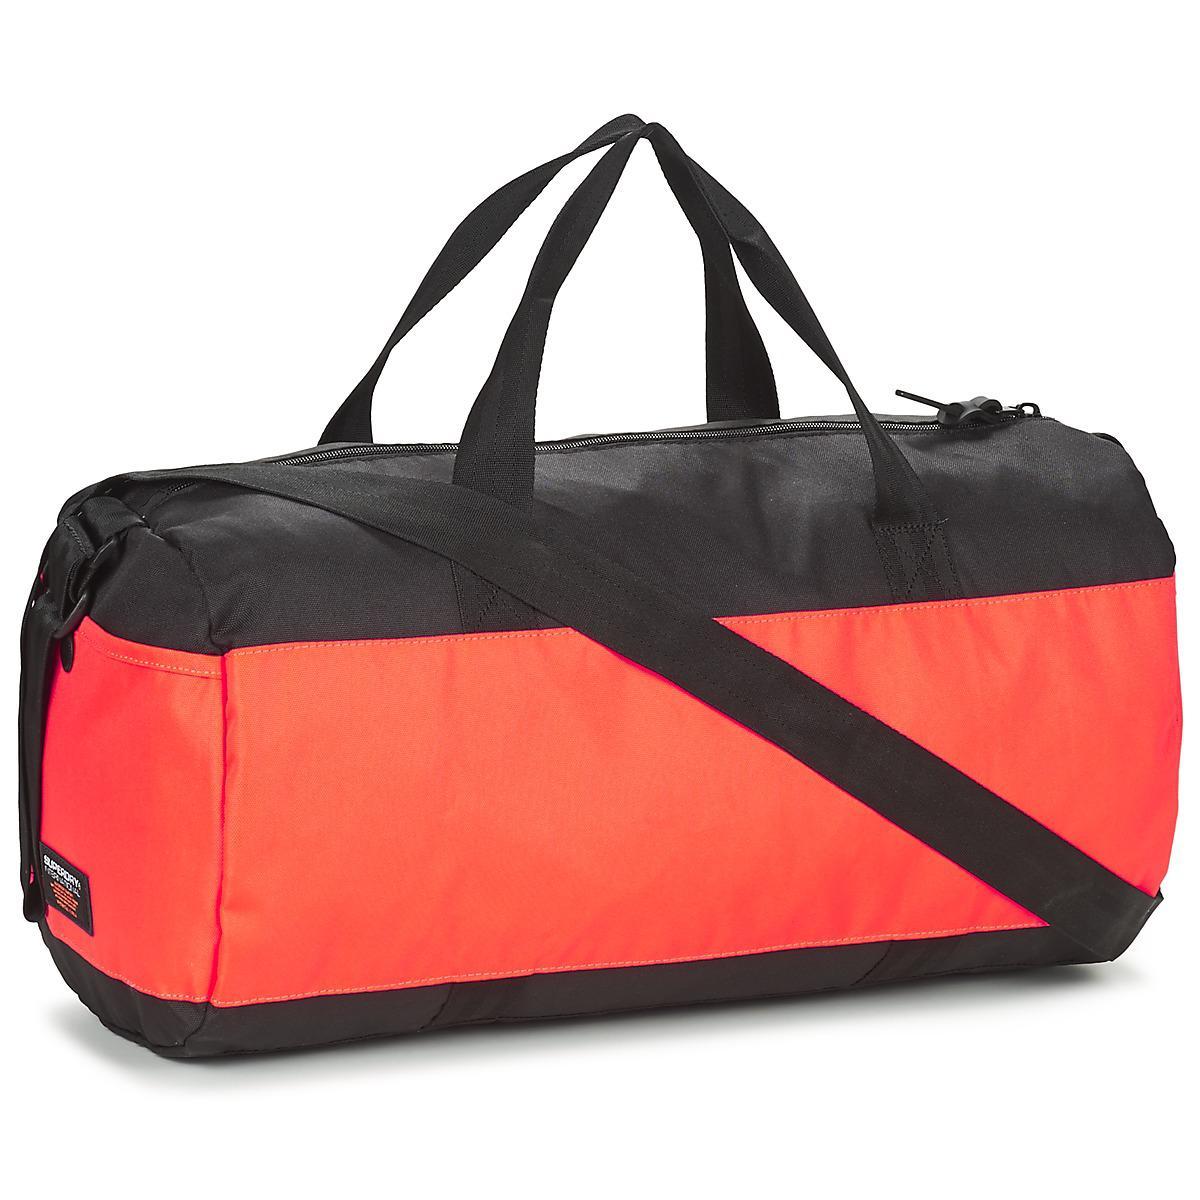 Superdry - Montana Barrel Women s Sports Bag In Black for Men - Lyst. View  fullscreen 1b309d9386